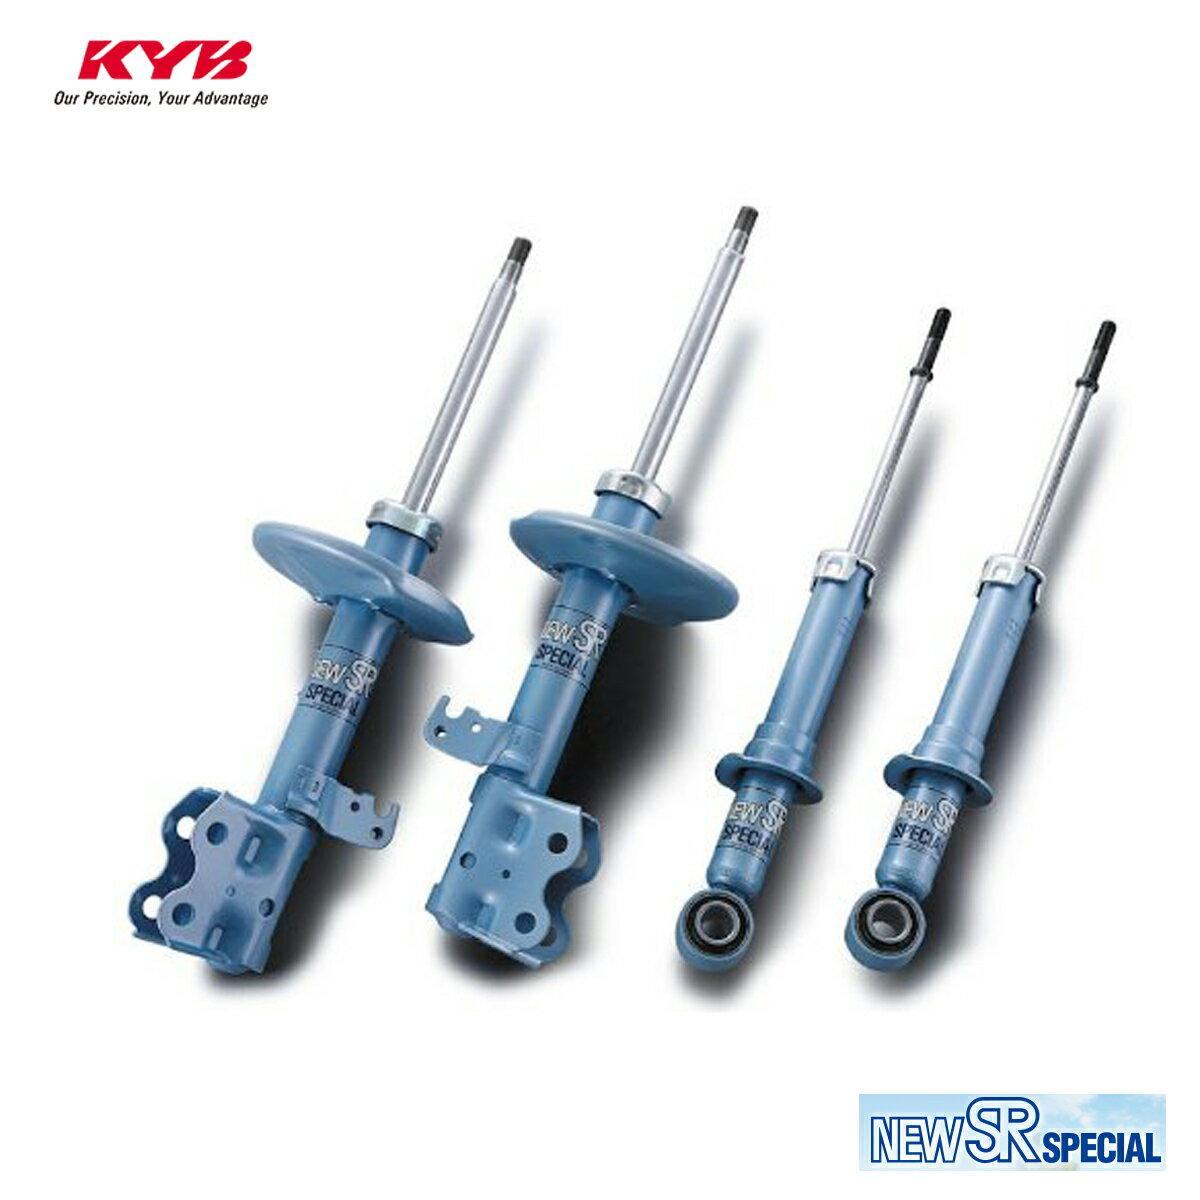 KYB カヤバ CRX EF6 ショックアブソーバー フロント 左用 1本 NEW SR SPECIAL NSF9009L 配送先条件有り